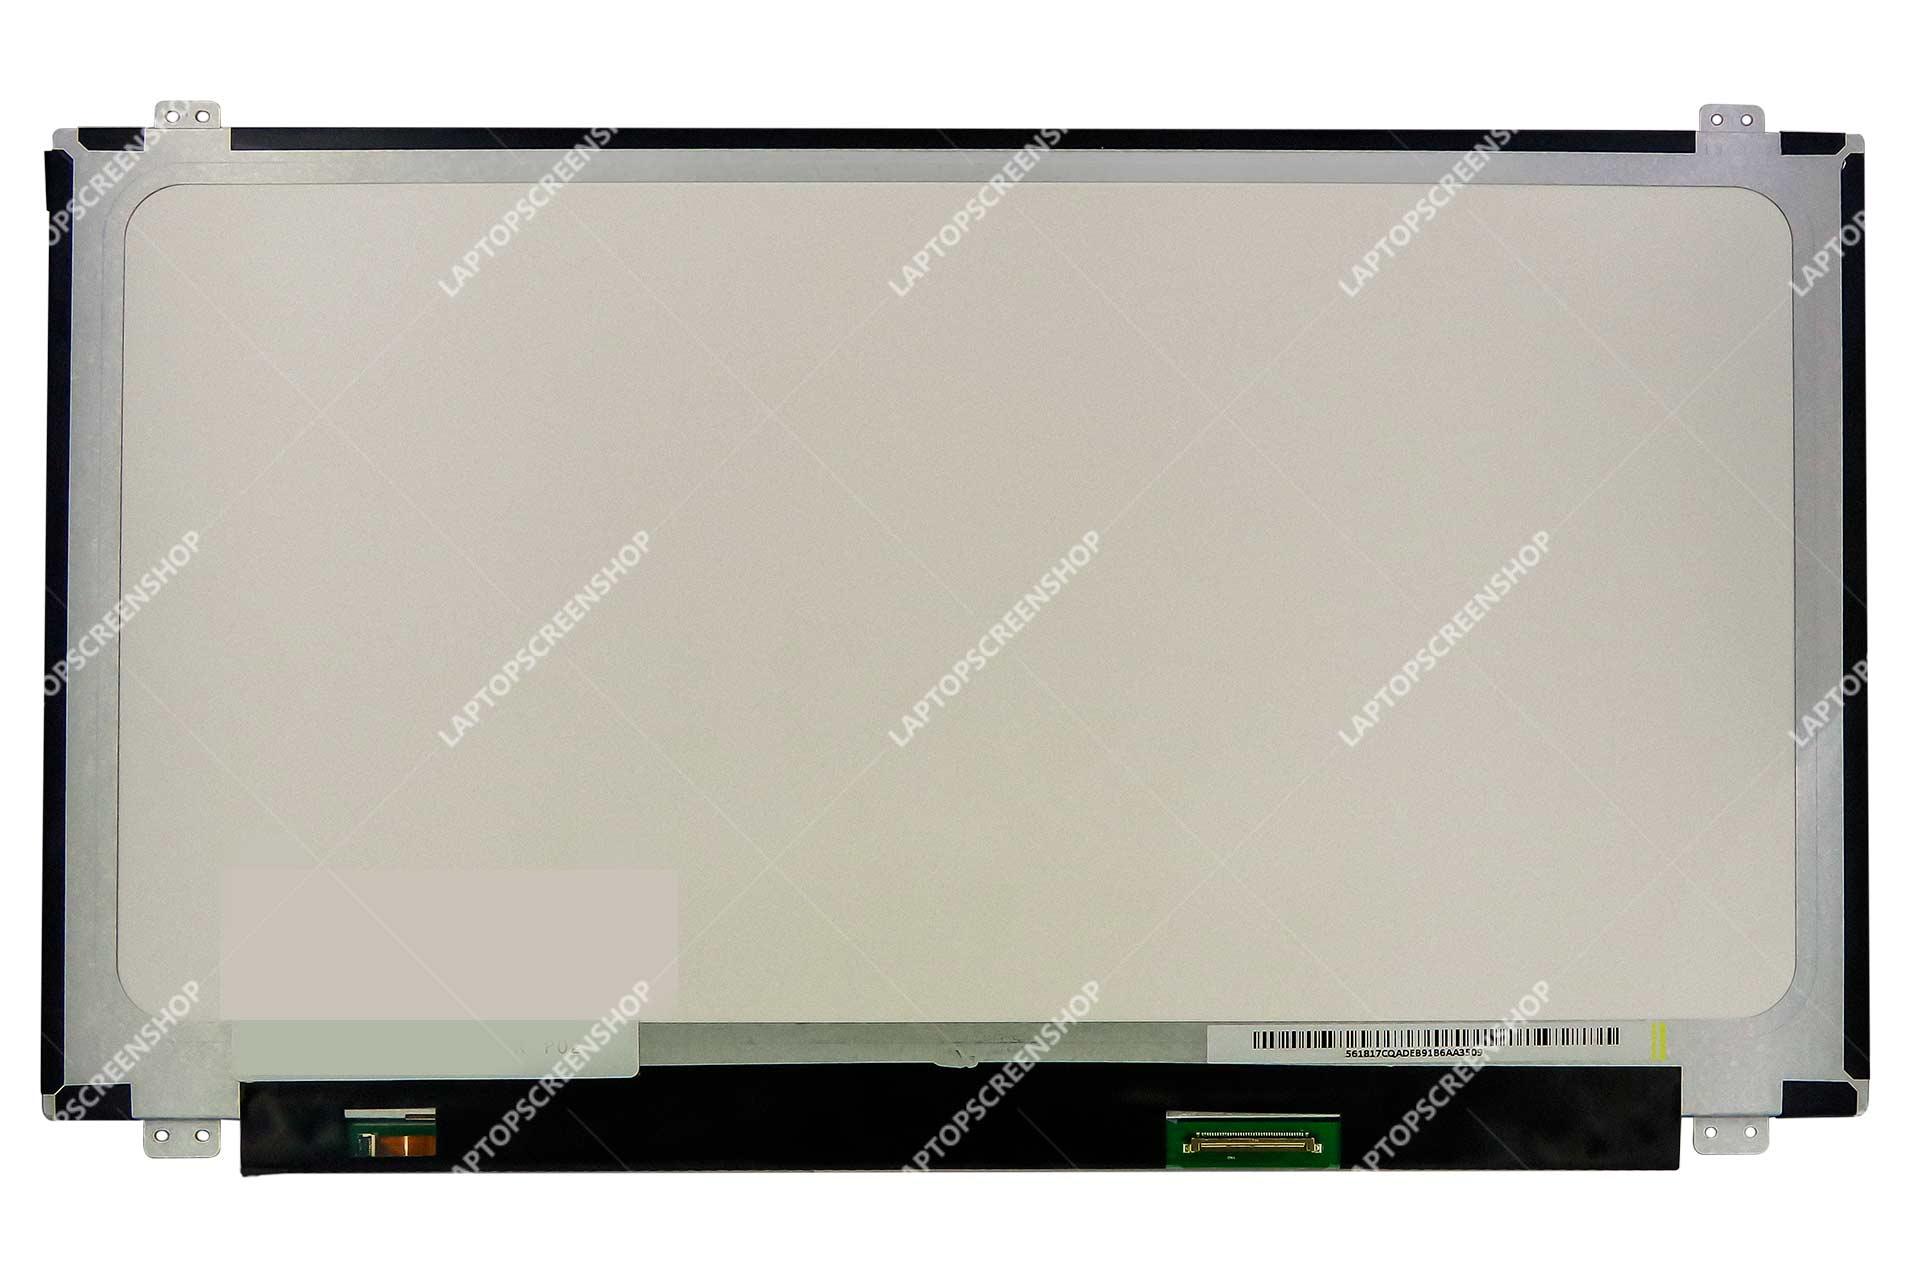 SONY-VAIO-SVS15115FDB-LCD |FHD|فروشگاه لپ تاپ اسکرين | تعمير لپ تاپ